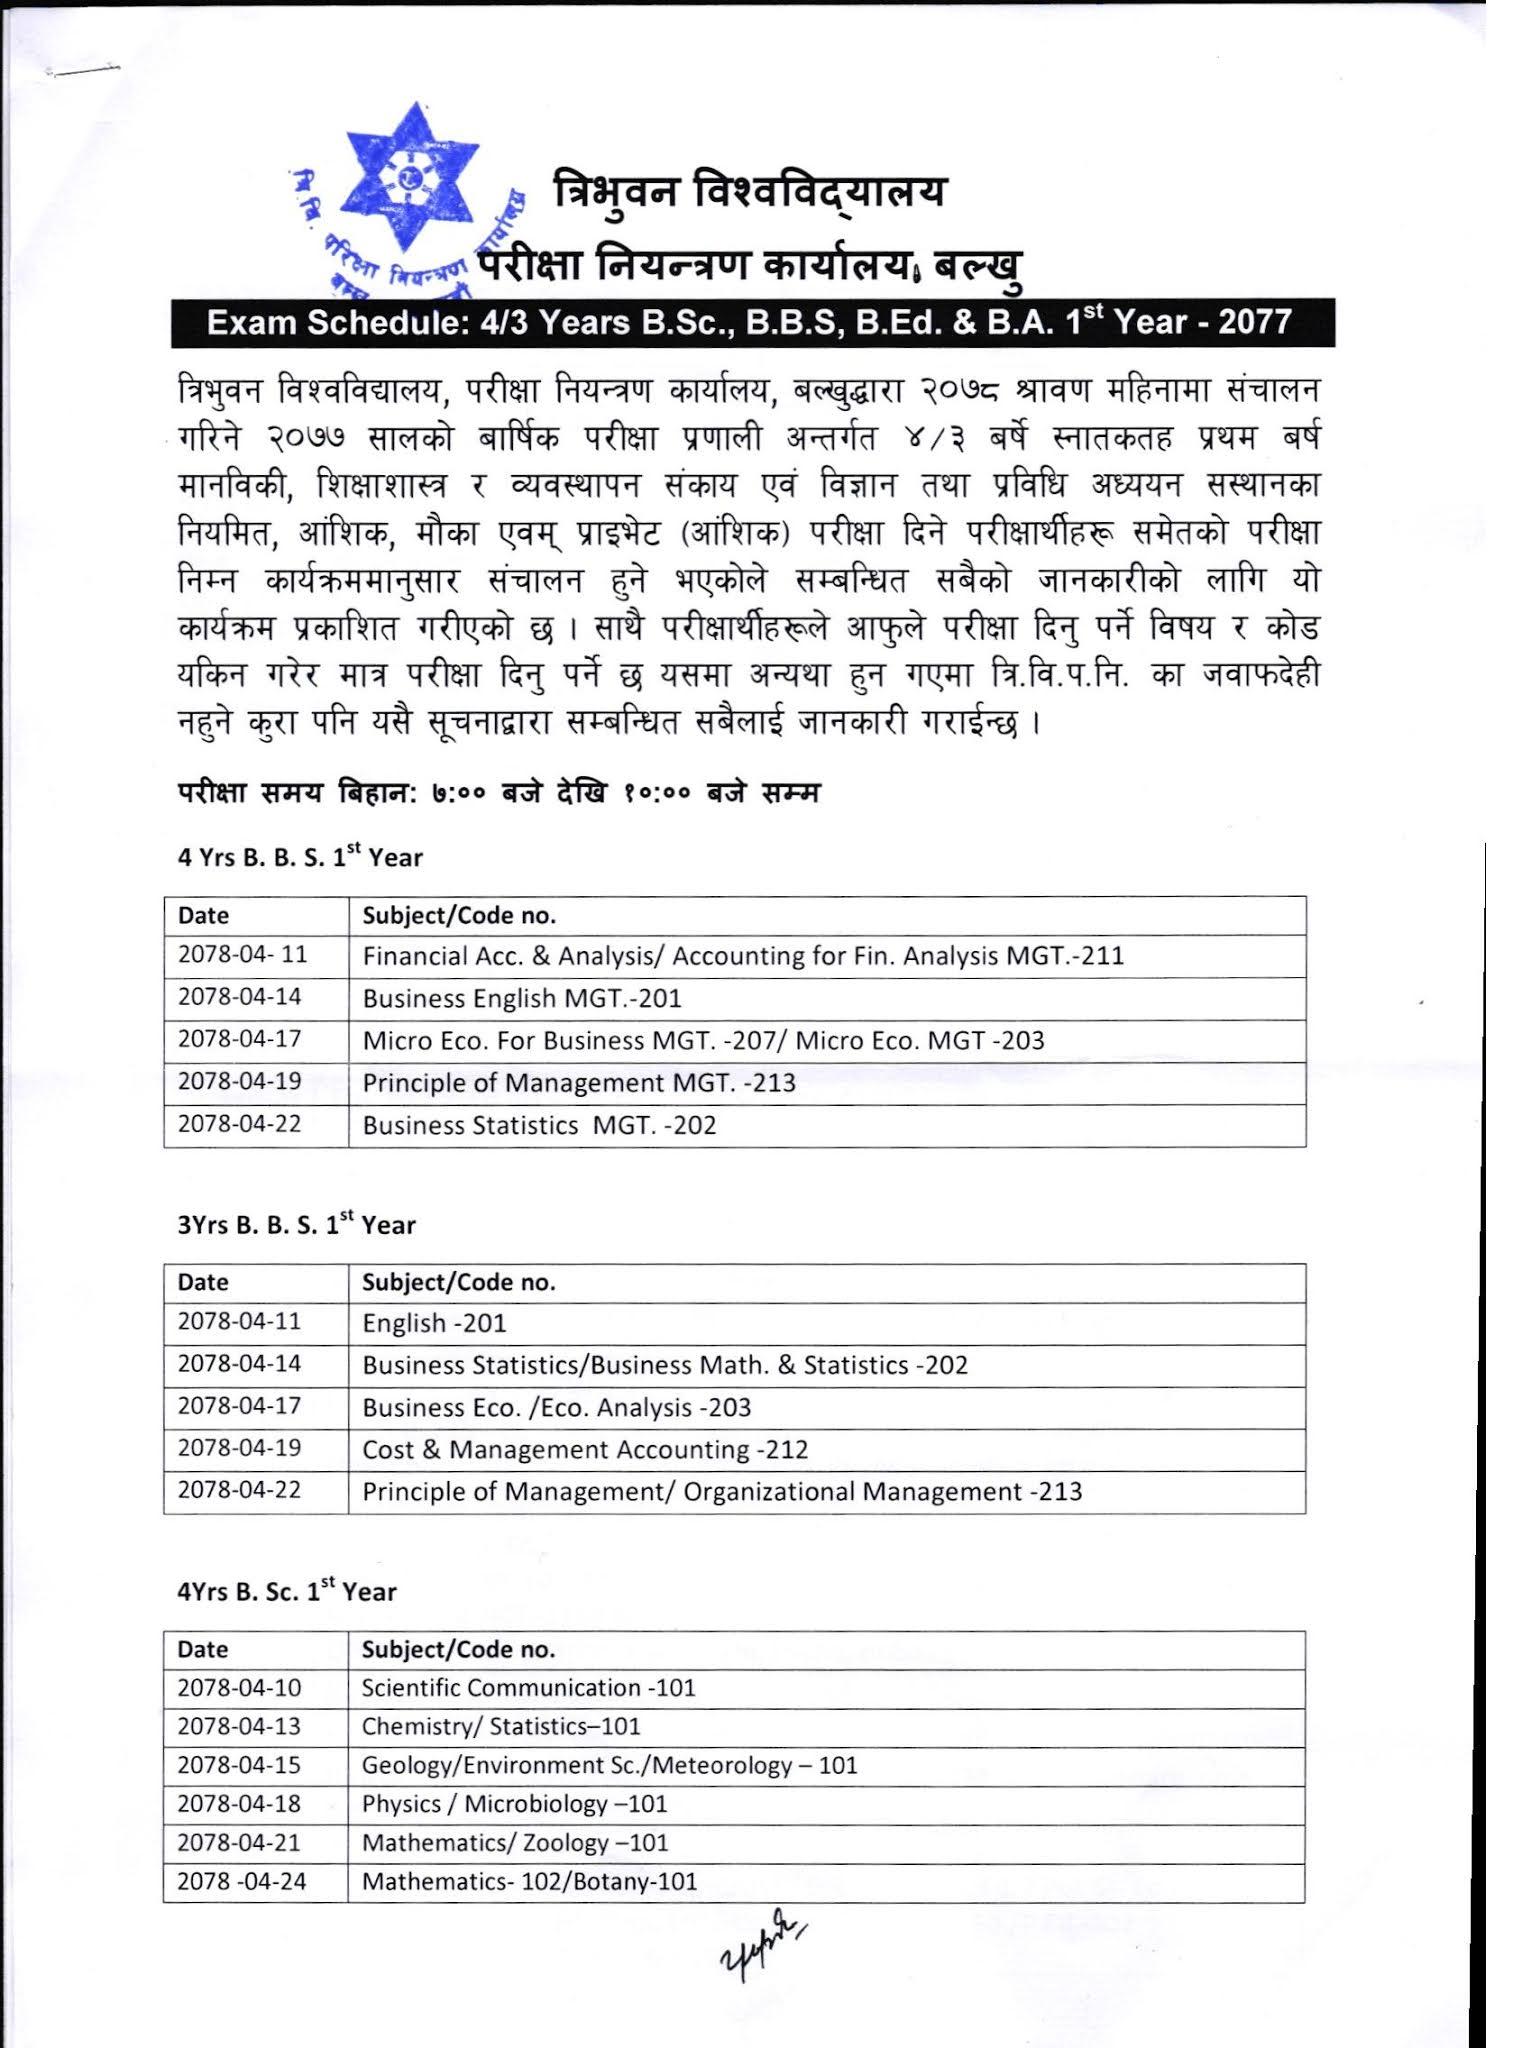 Exam Schedule 4/3 Years B.Sc., B.B.S, B.Ed. & BA 1st Year - 2078